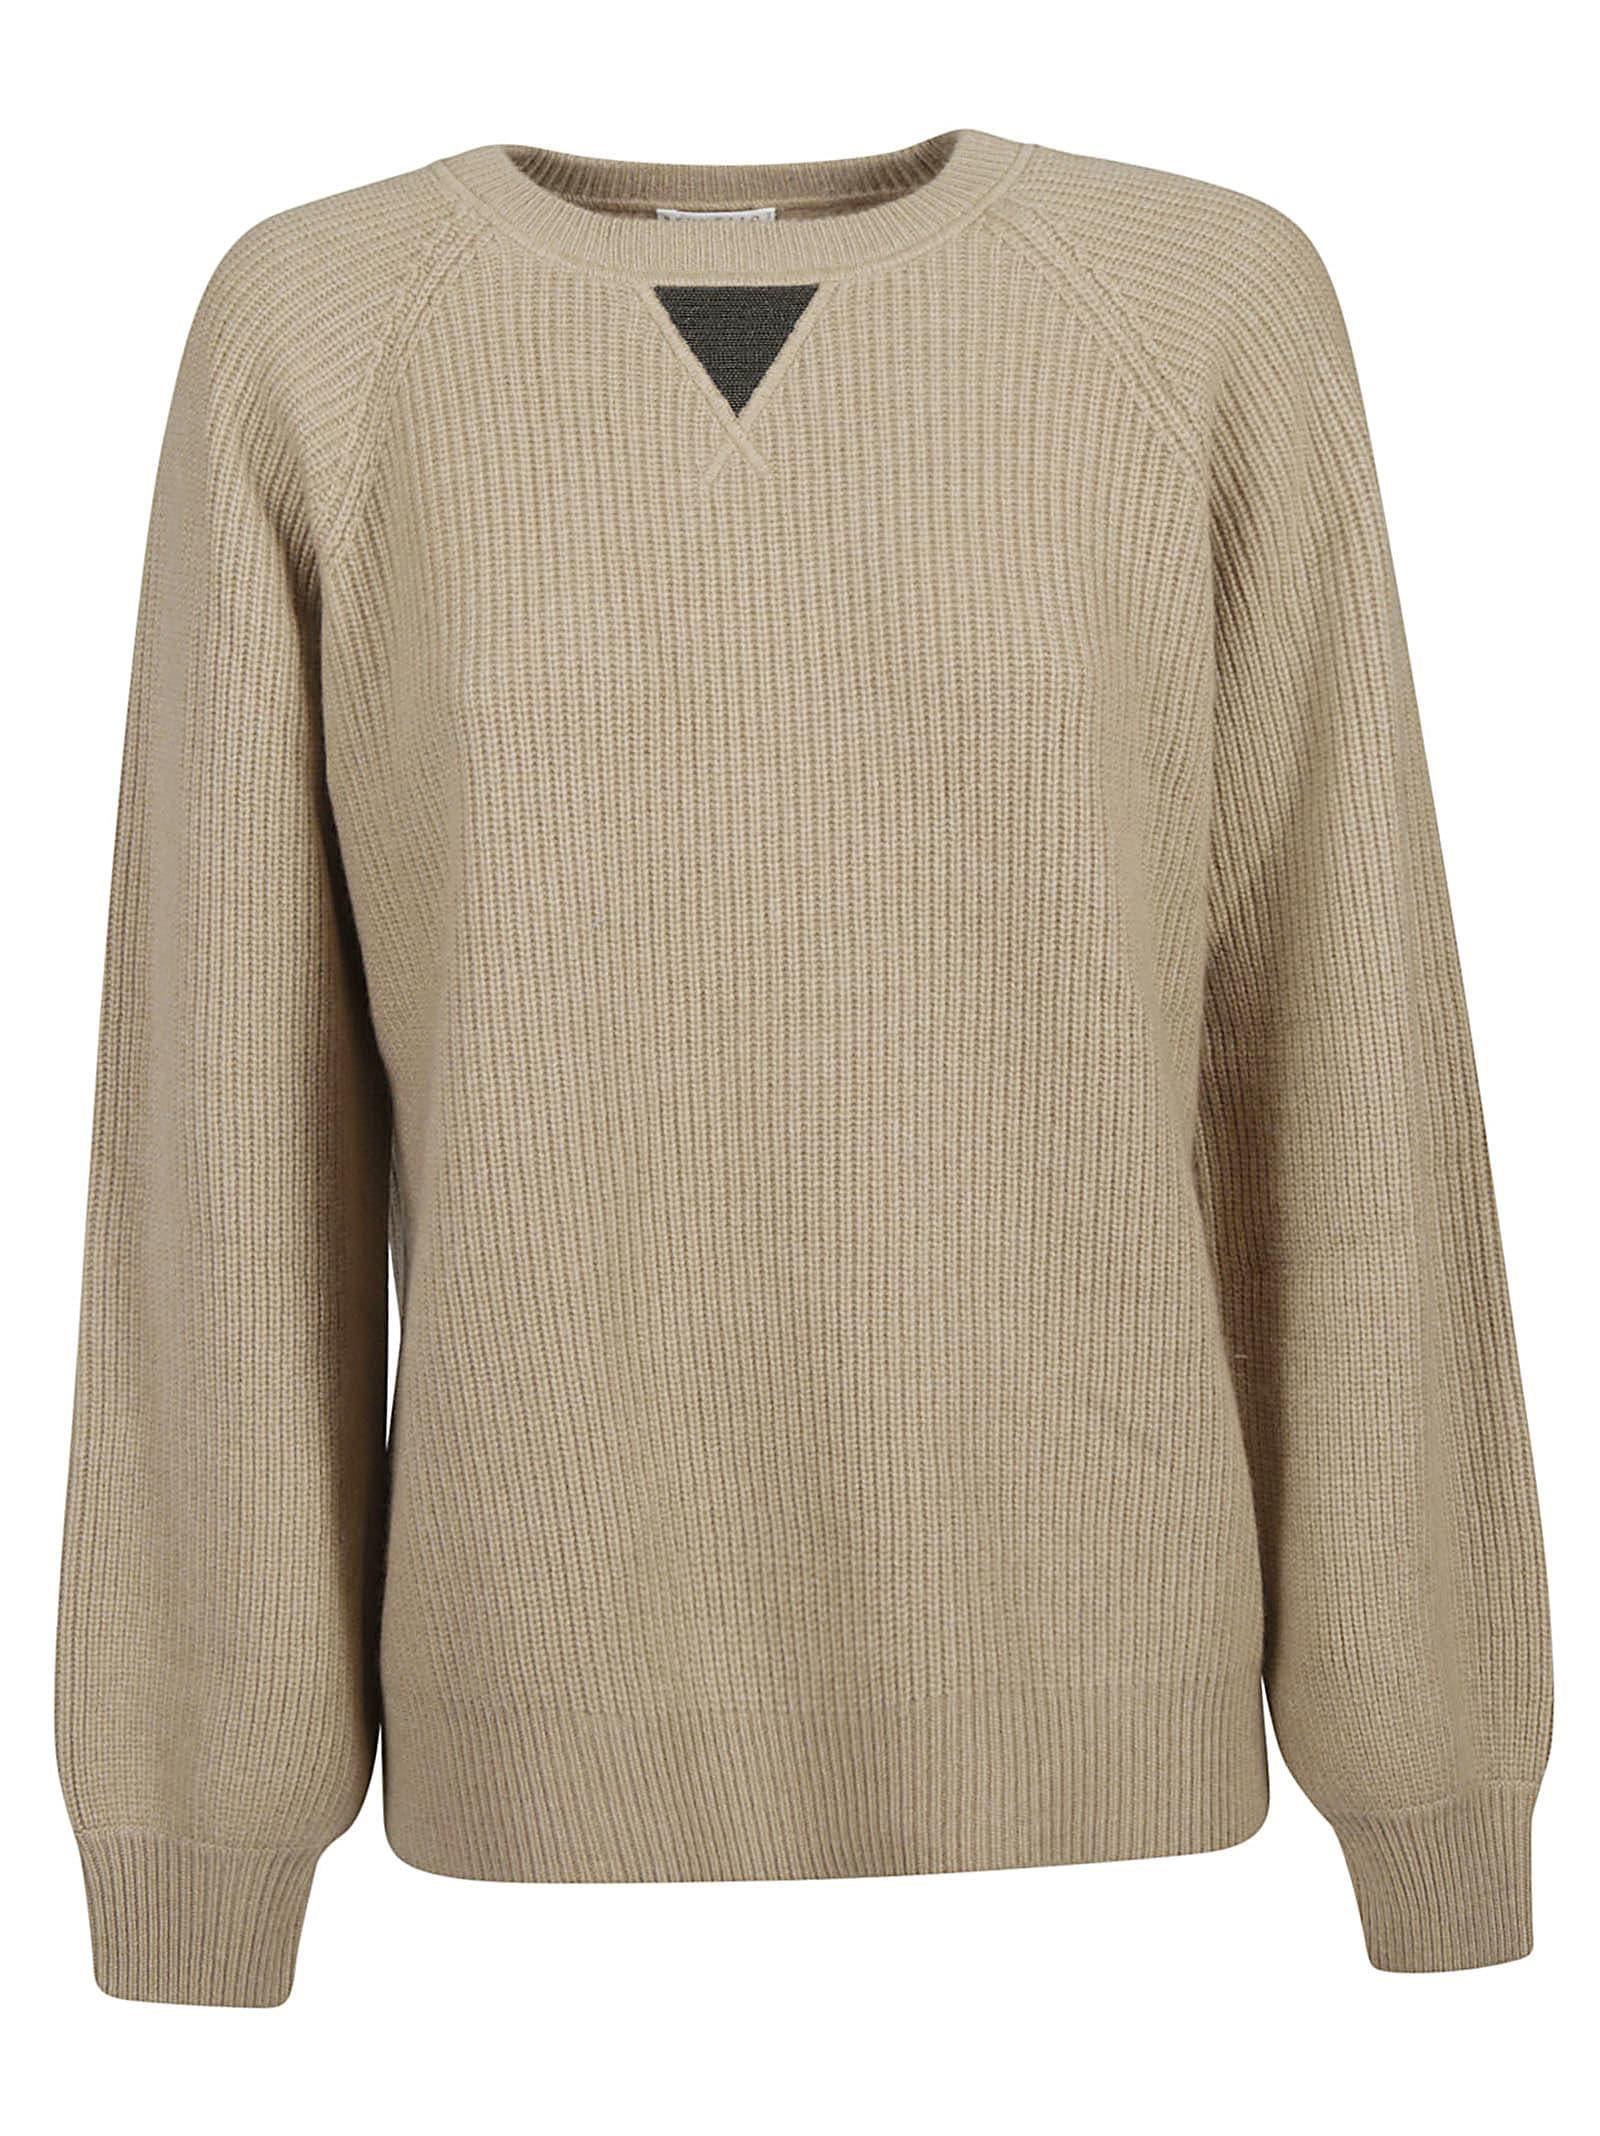 Brunello Cucinelli Embellished Knit Sweater